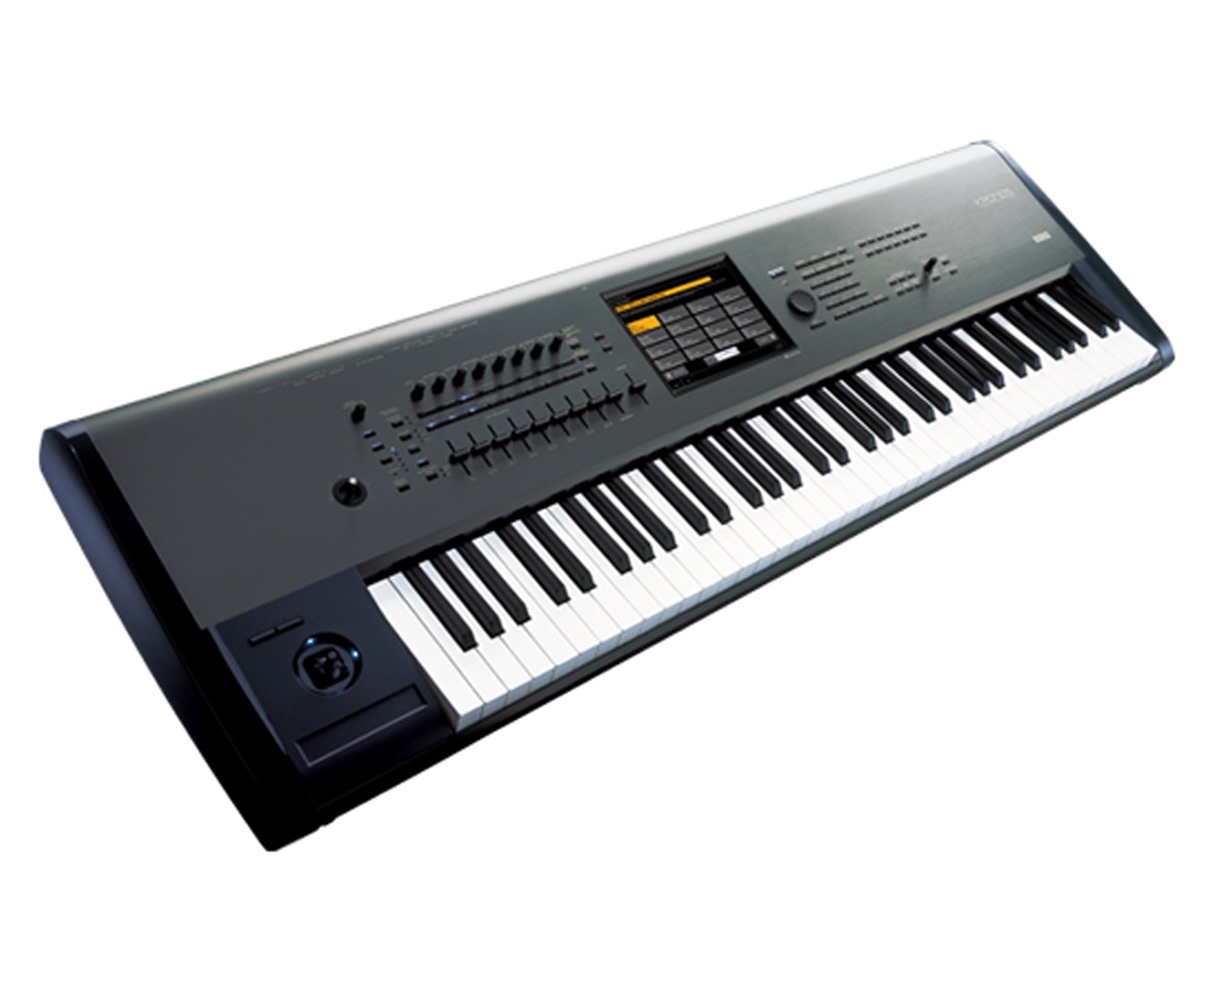 korg kronos 88 synthesizer workstation 88 key keyboard proaudiostar ebay. Black Bedroom Furniture Sets. Home Design Ideas